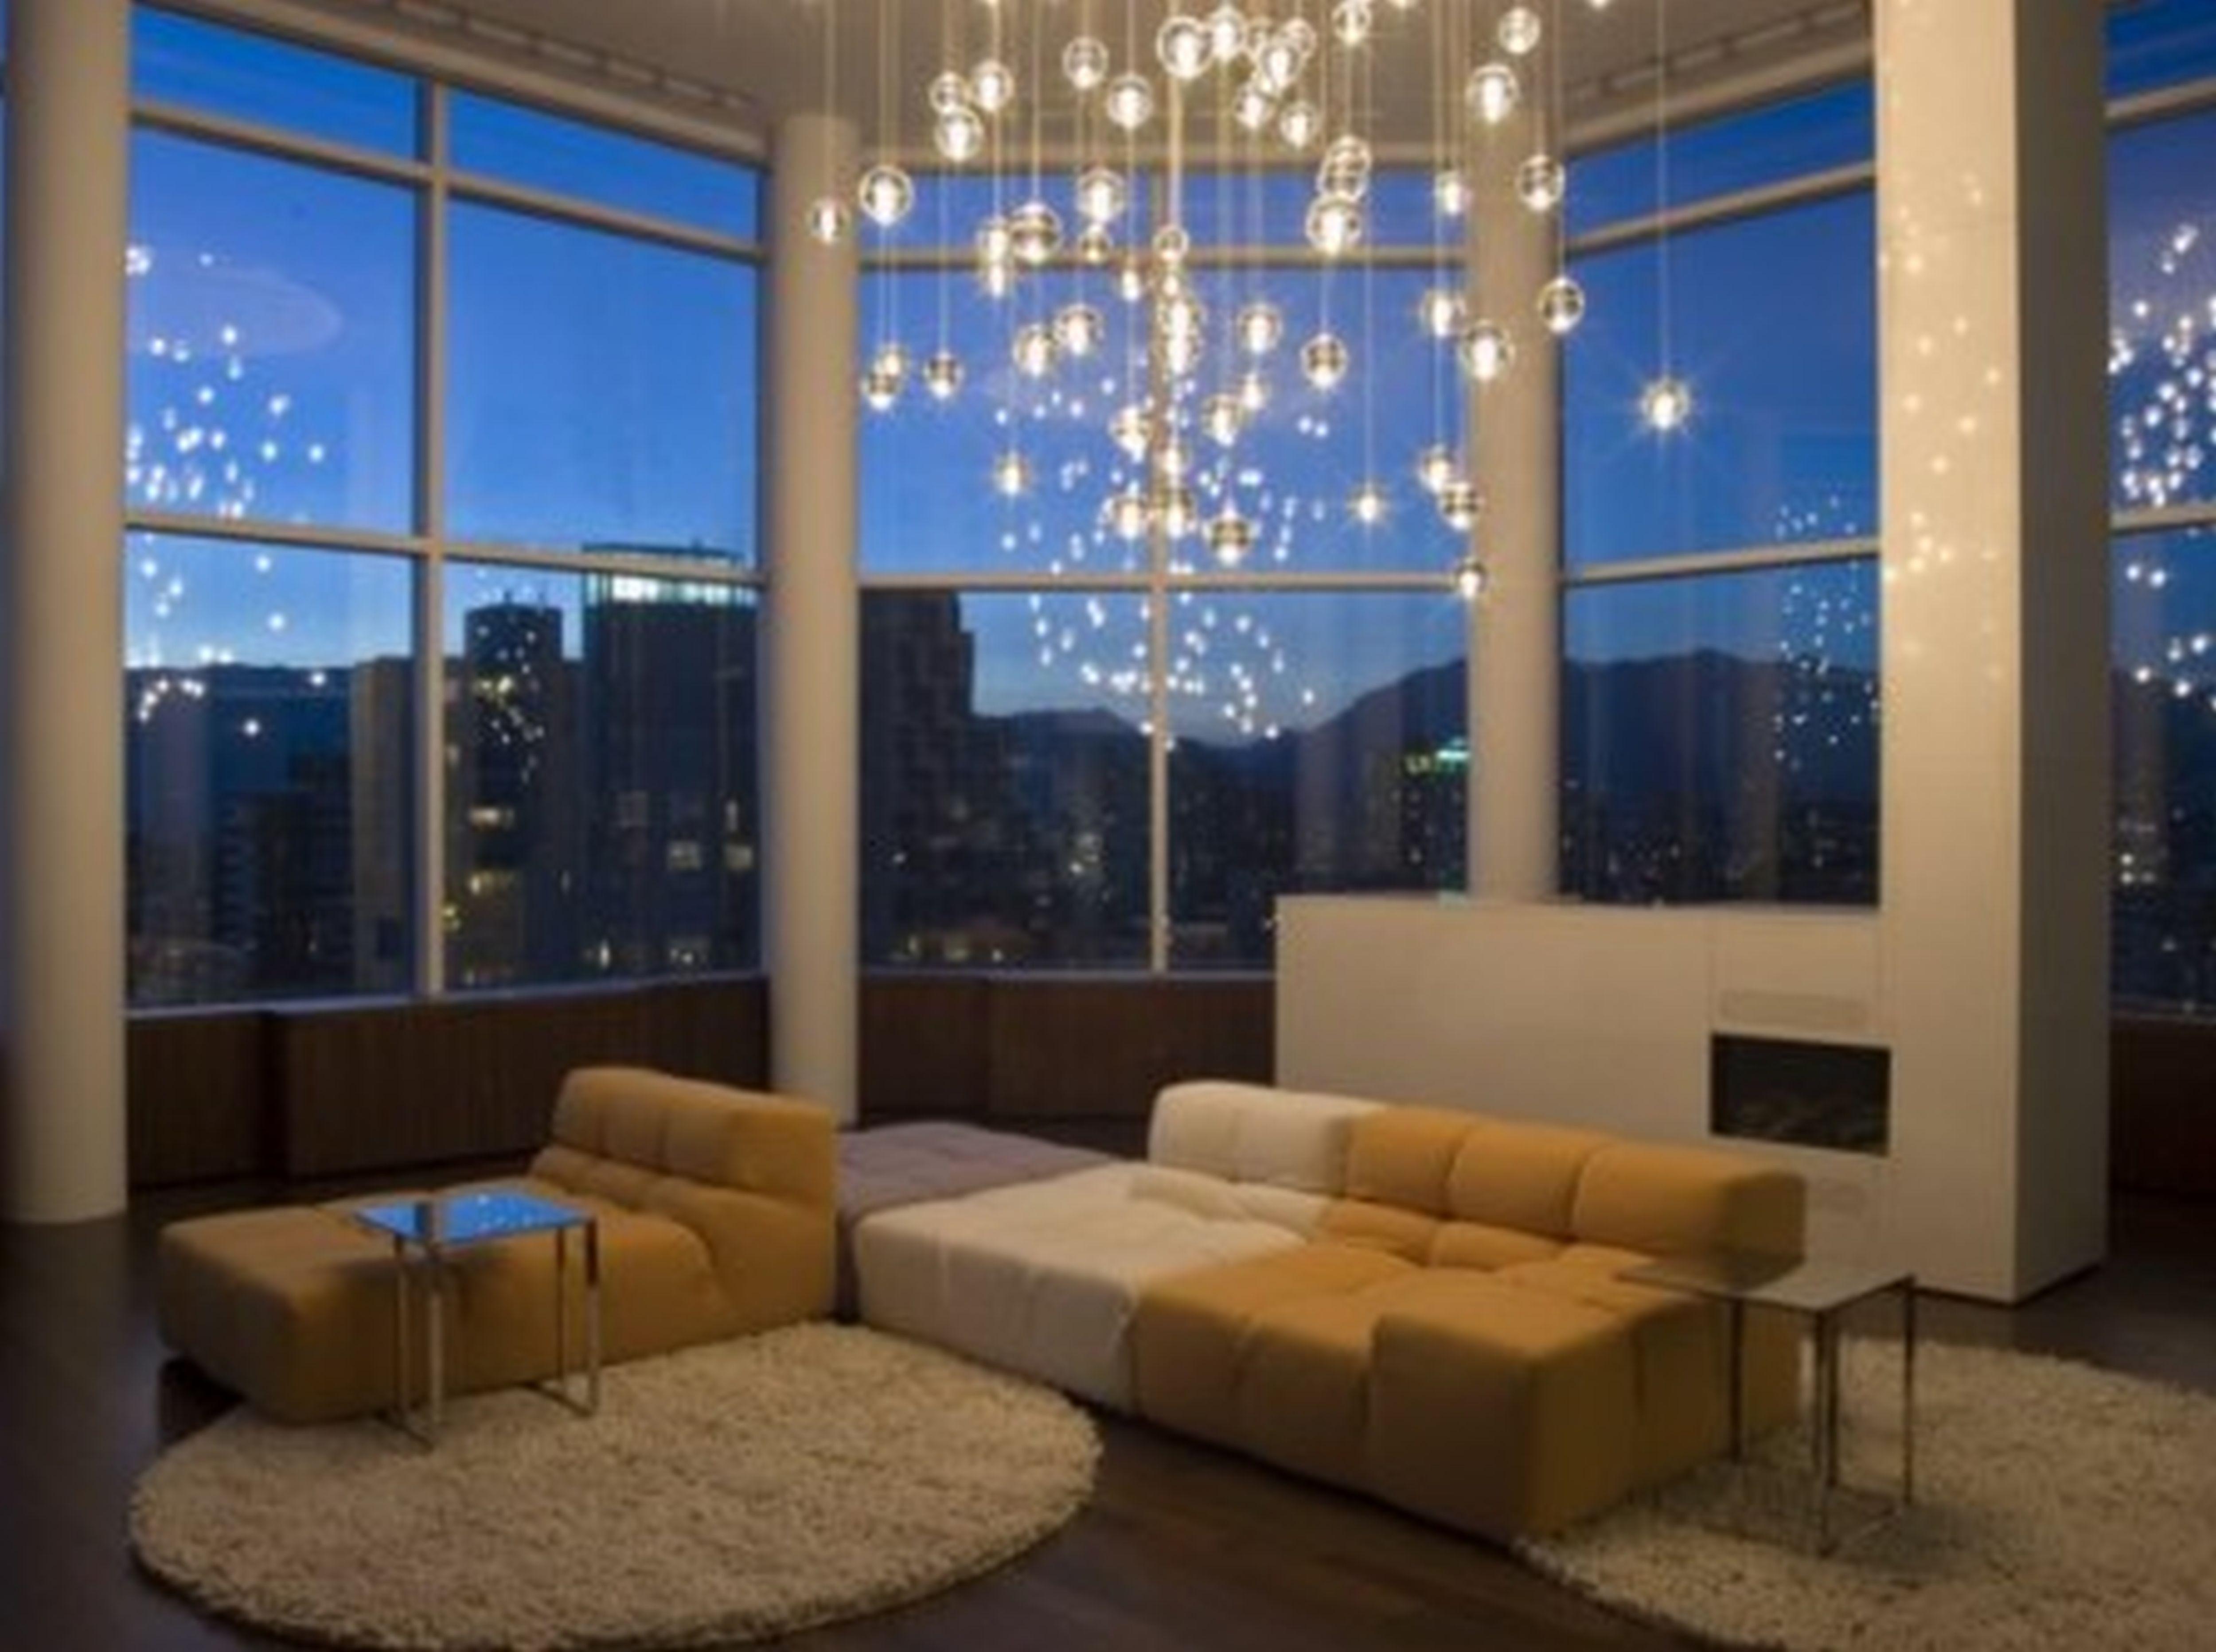 Living Room Lighting Ideas Of Photos